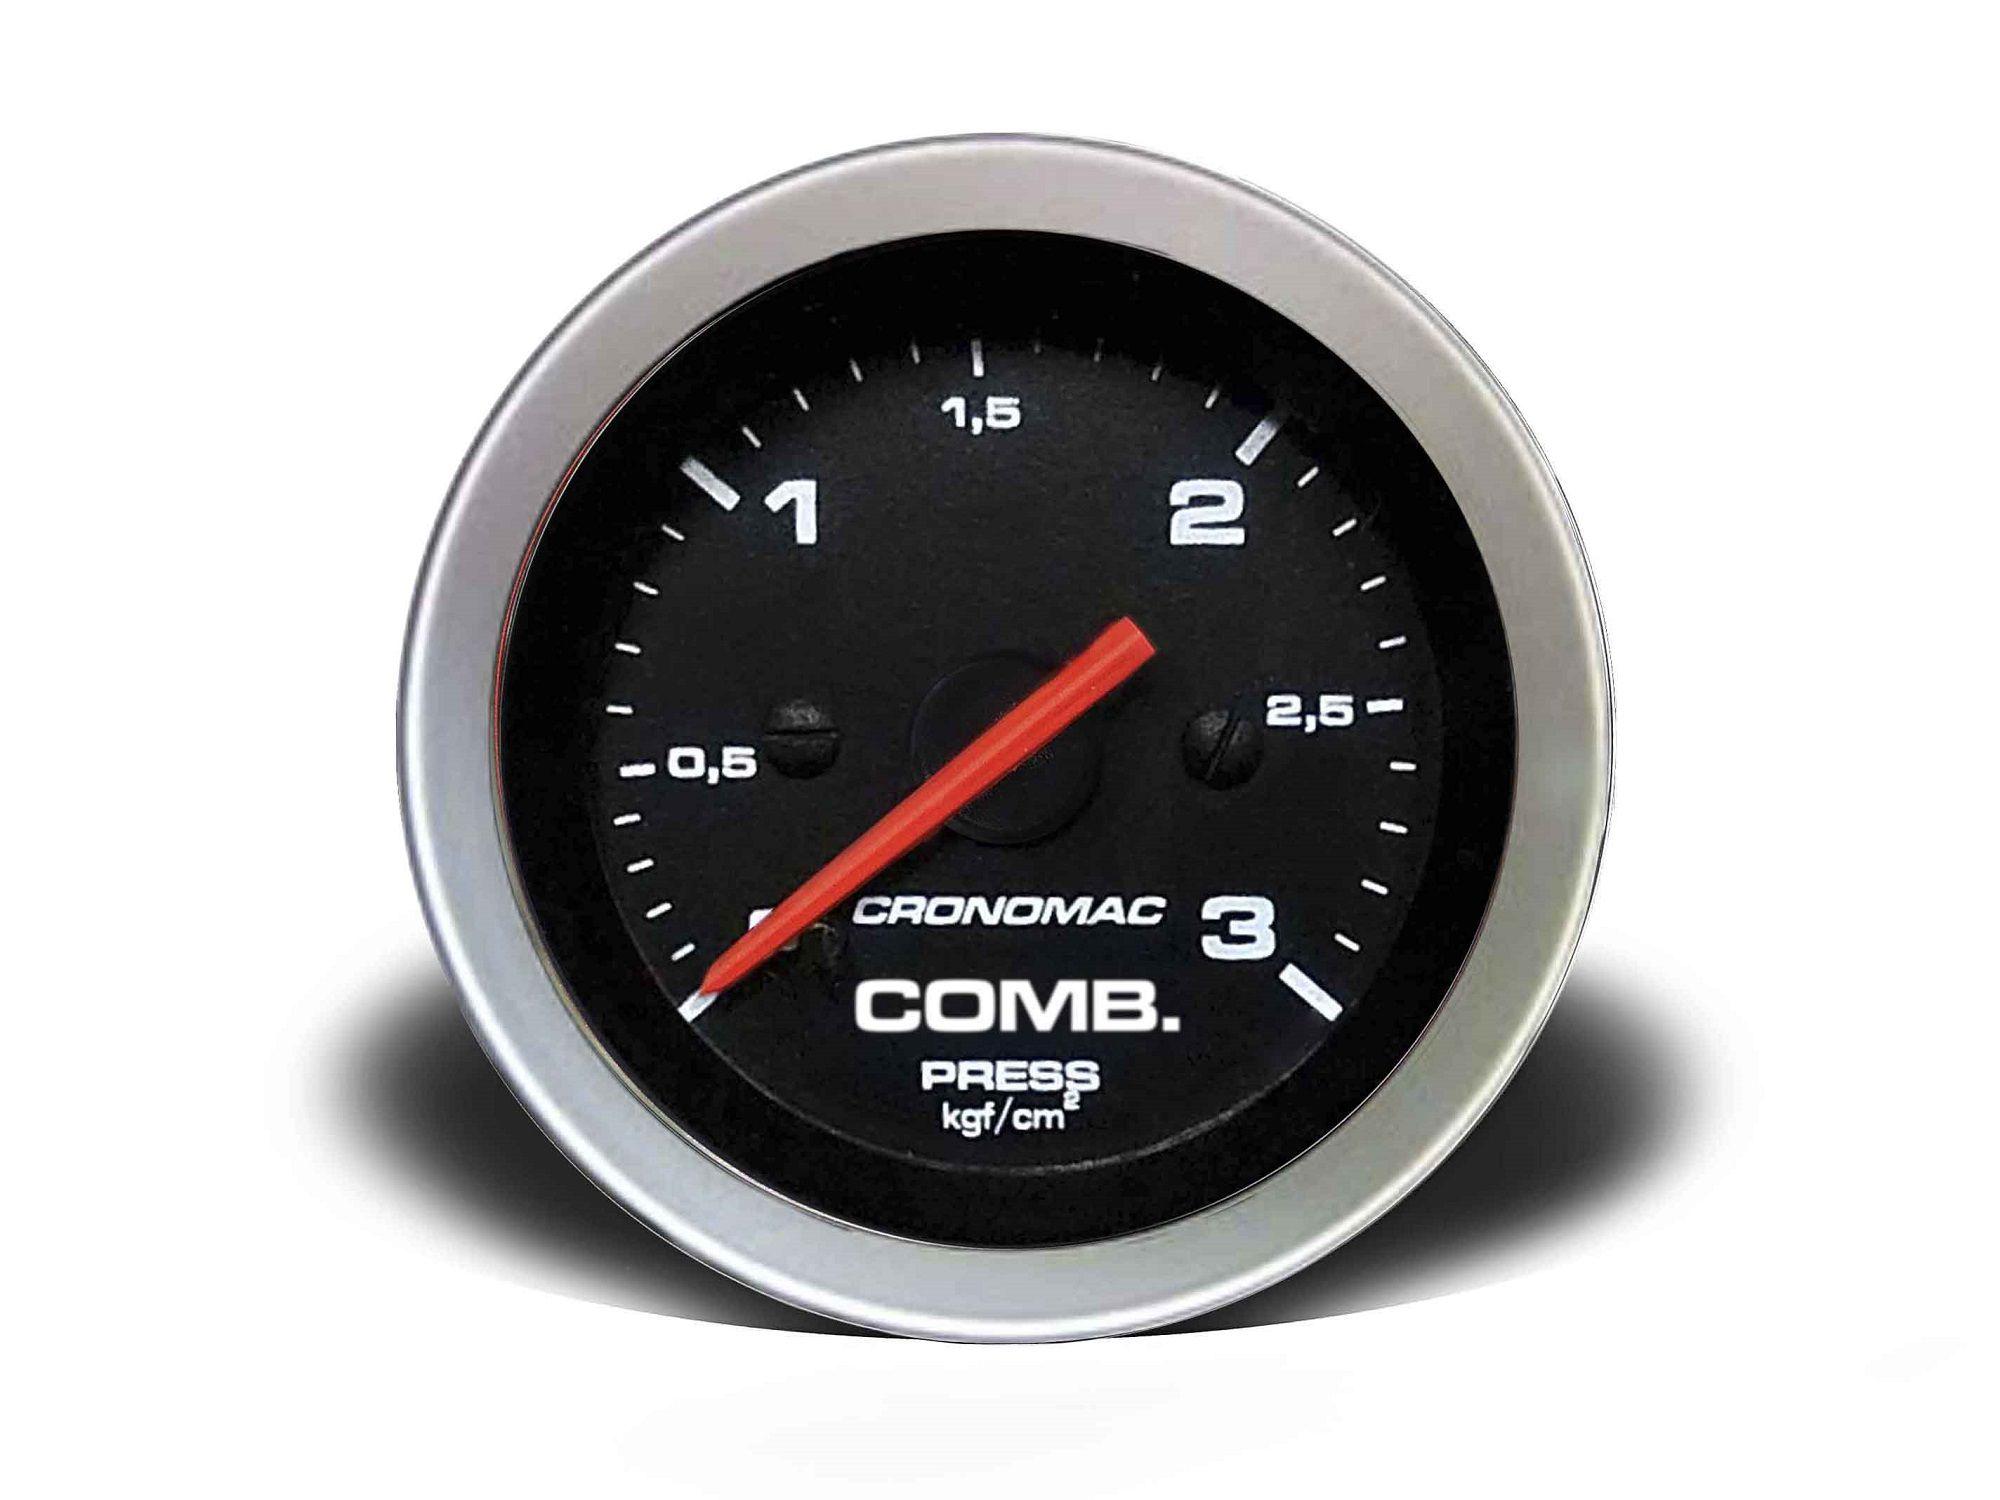 Relogio Pressao de Comb. 3kg Sport 52mm Cronomac